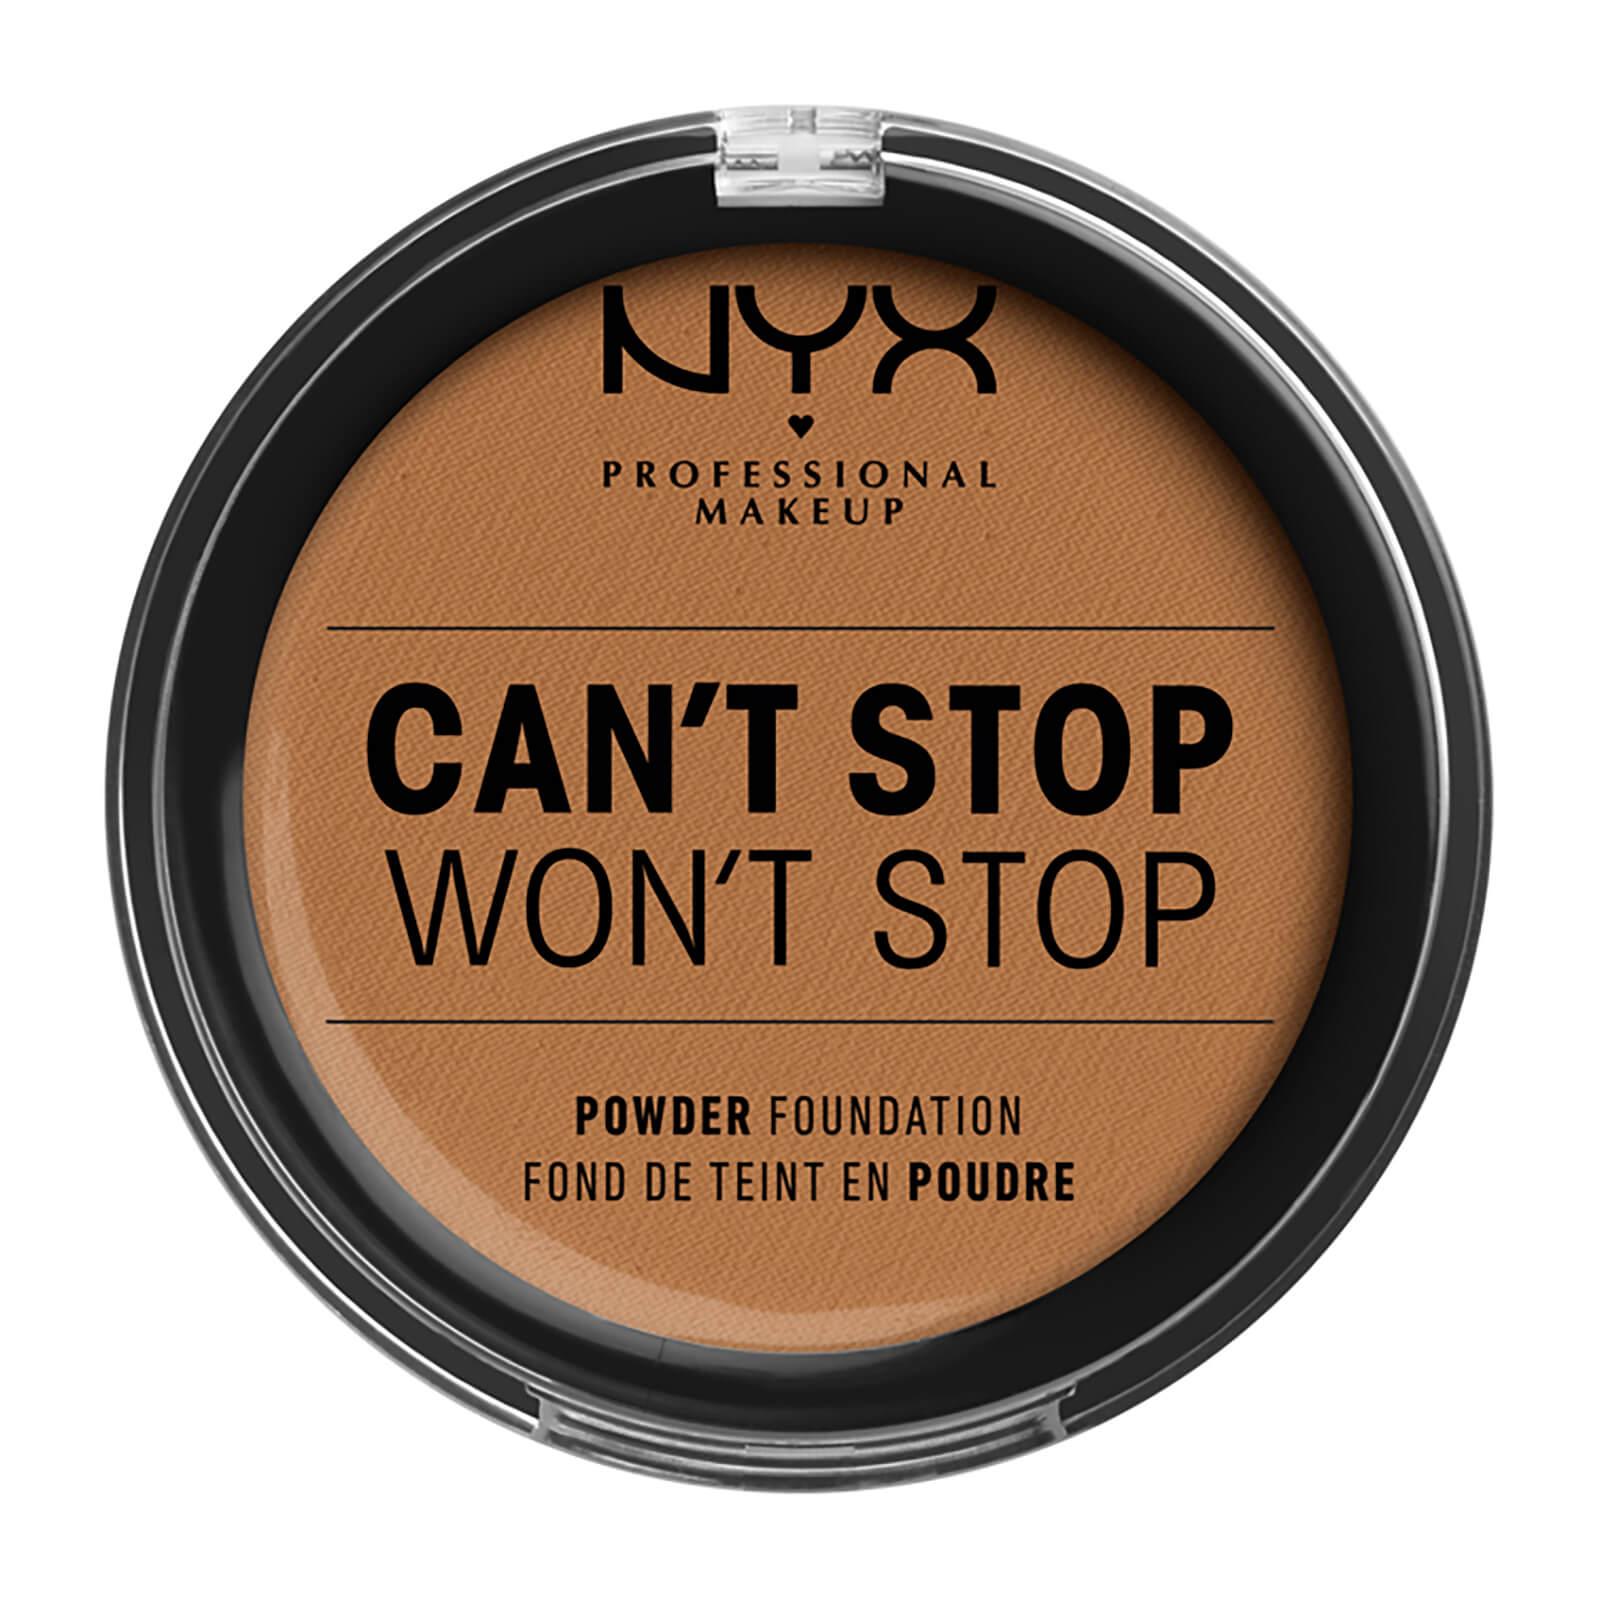 nyx professional makeup can't stop won't stop powder foundation (various shades) - warm honey